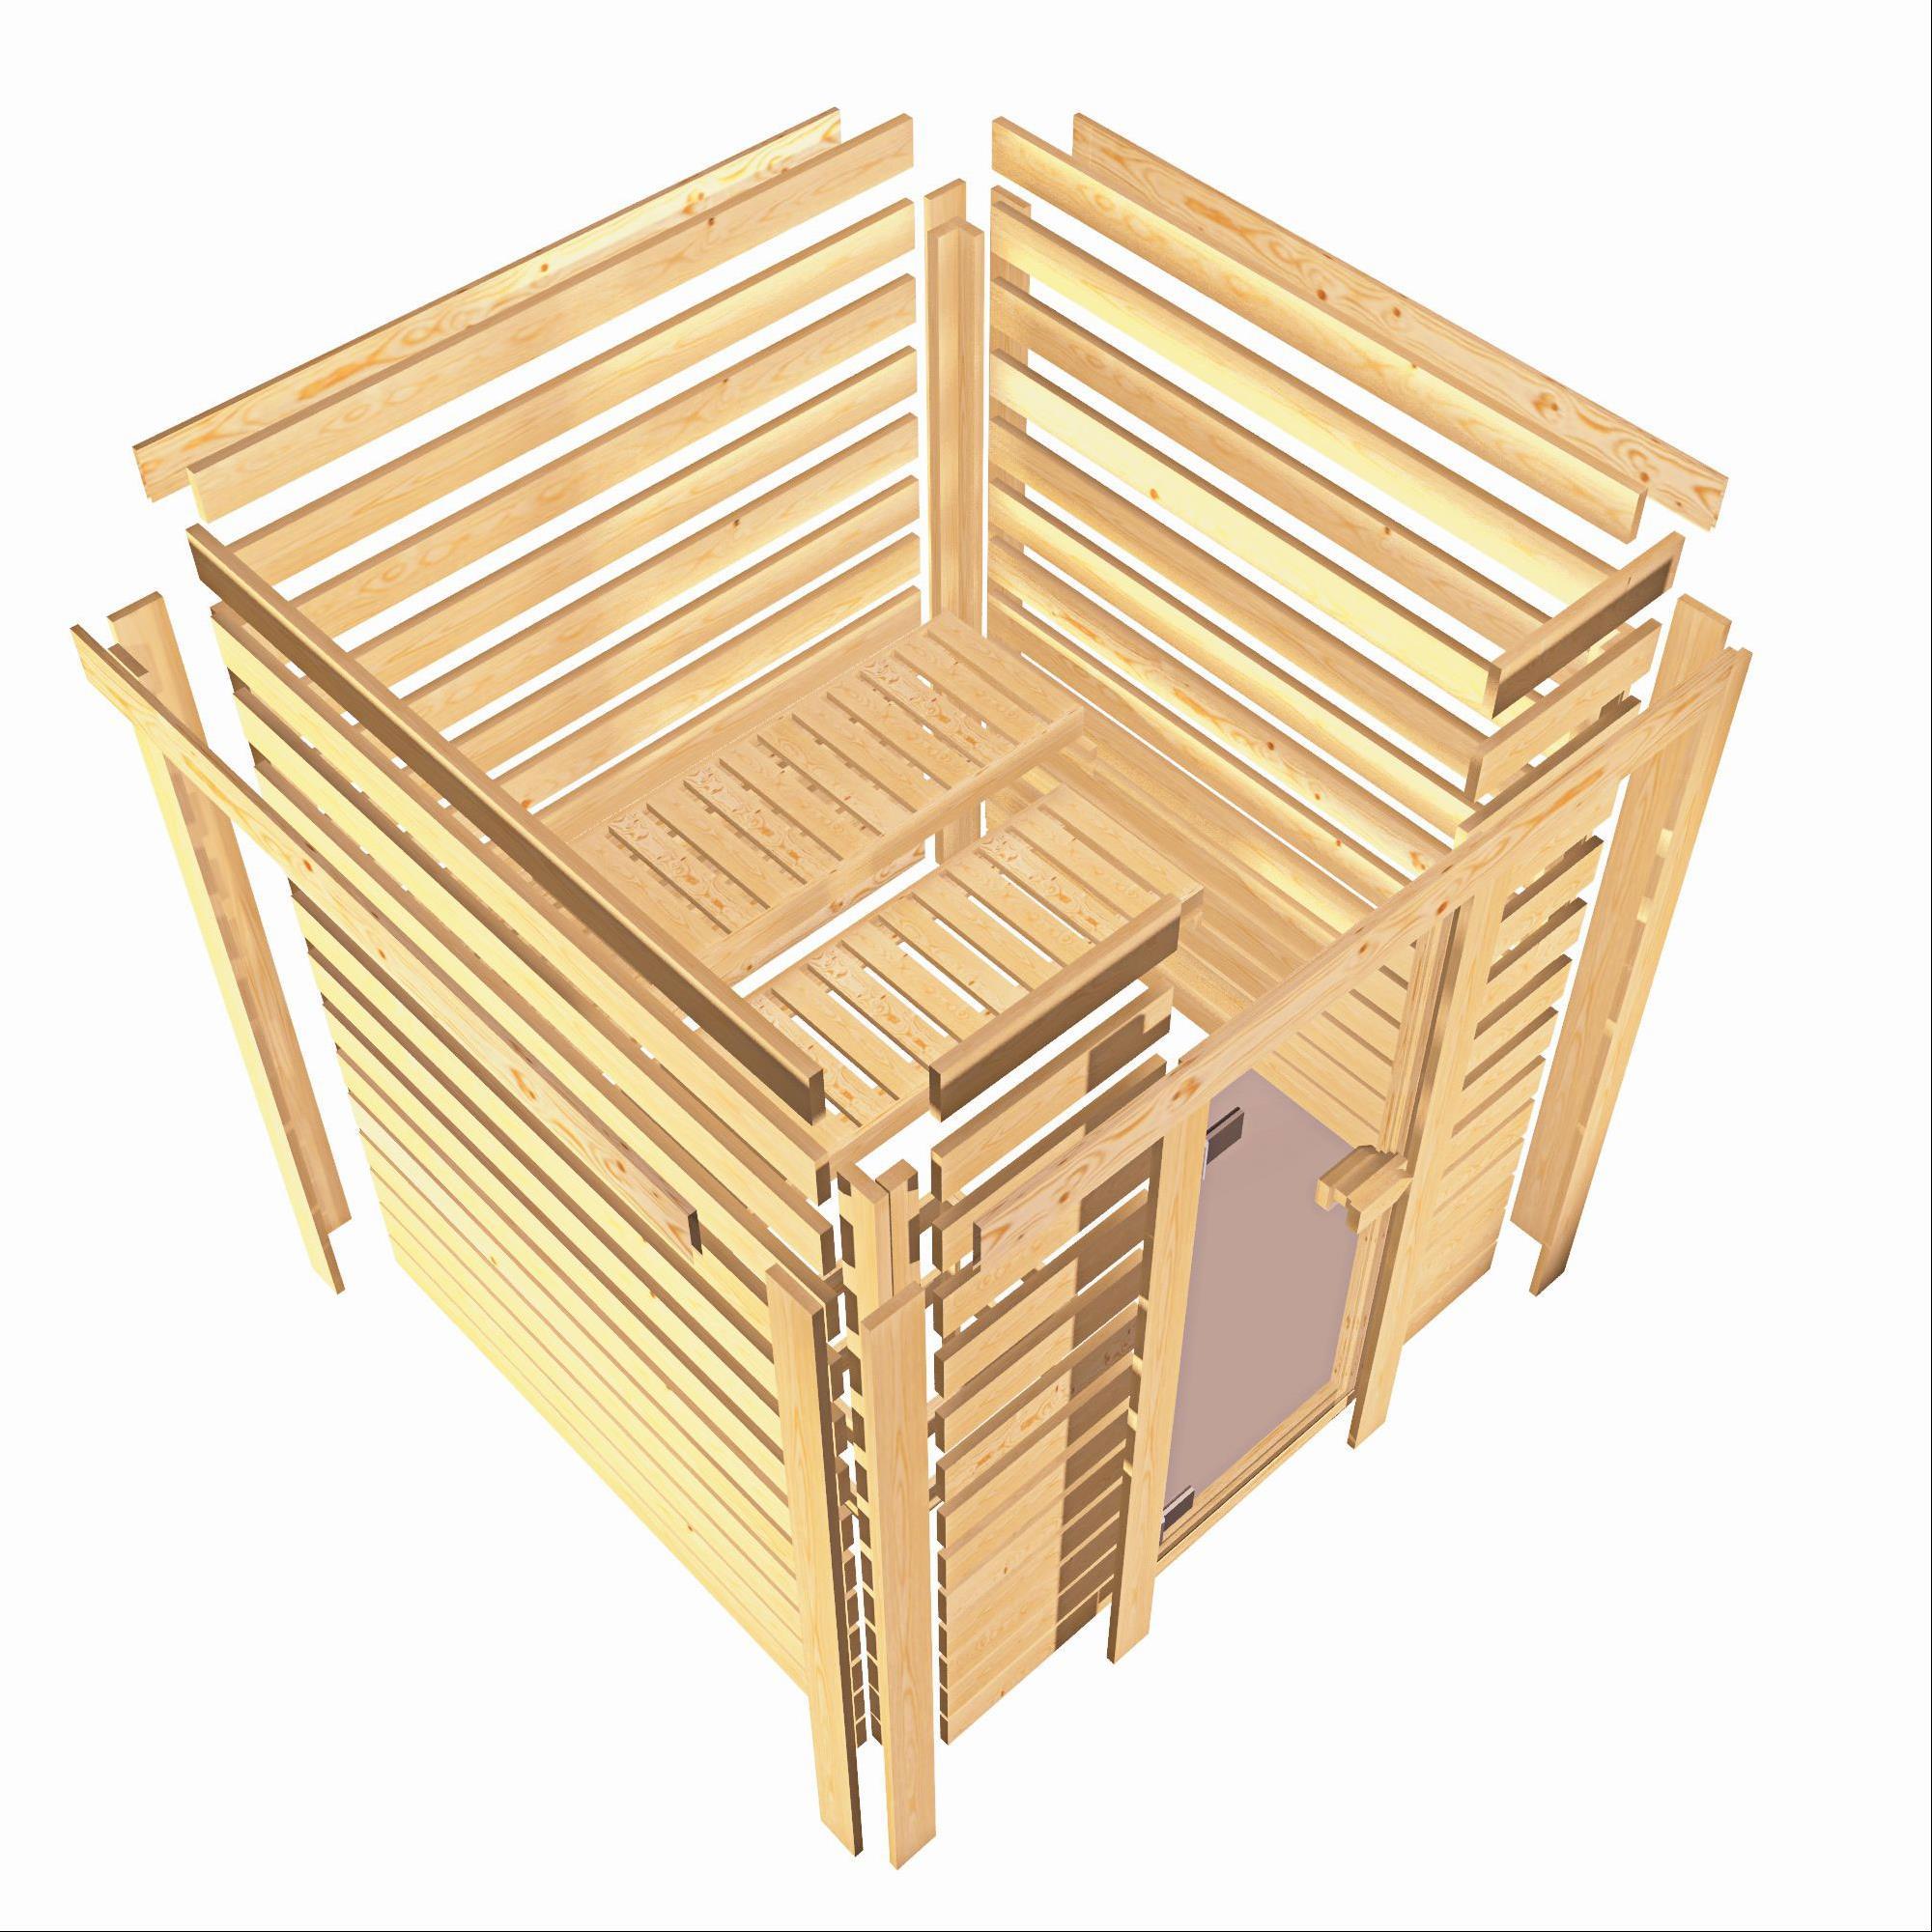 Woodfeeling Sauna Karla 38mm Kranz Ofen Bio 9kW Tür Holz Bild 4